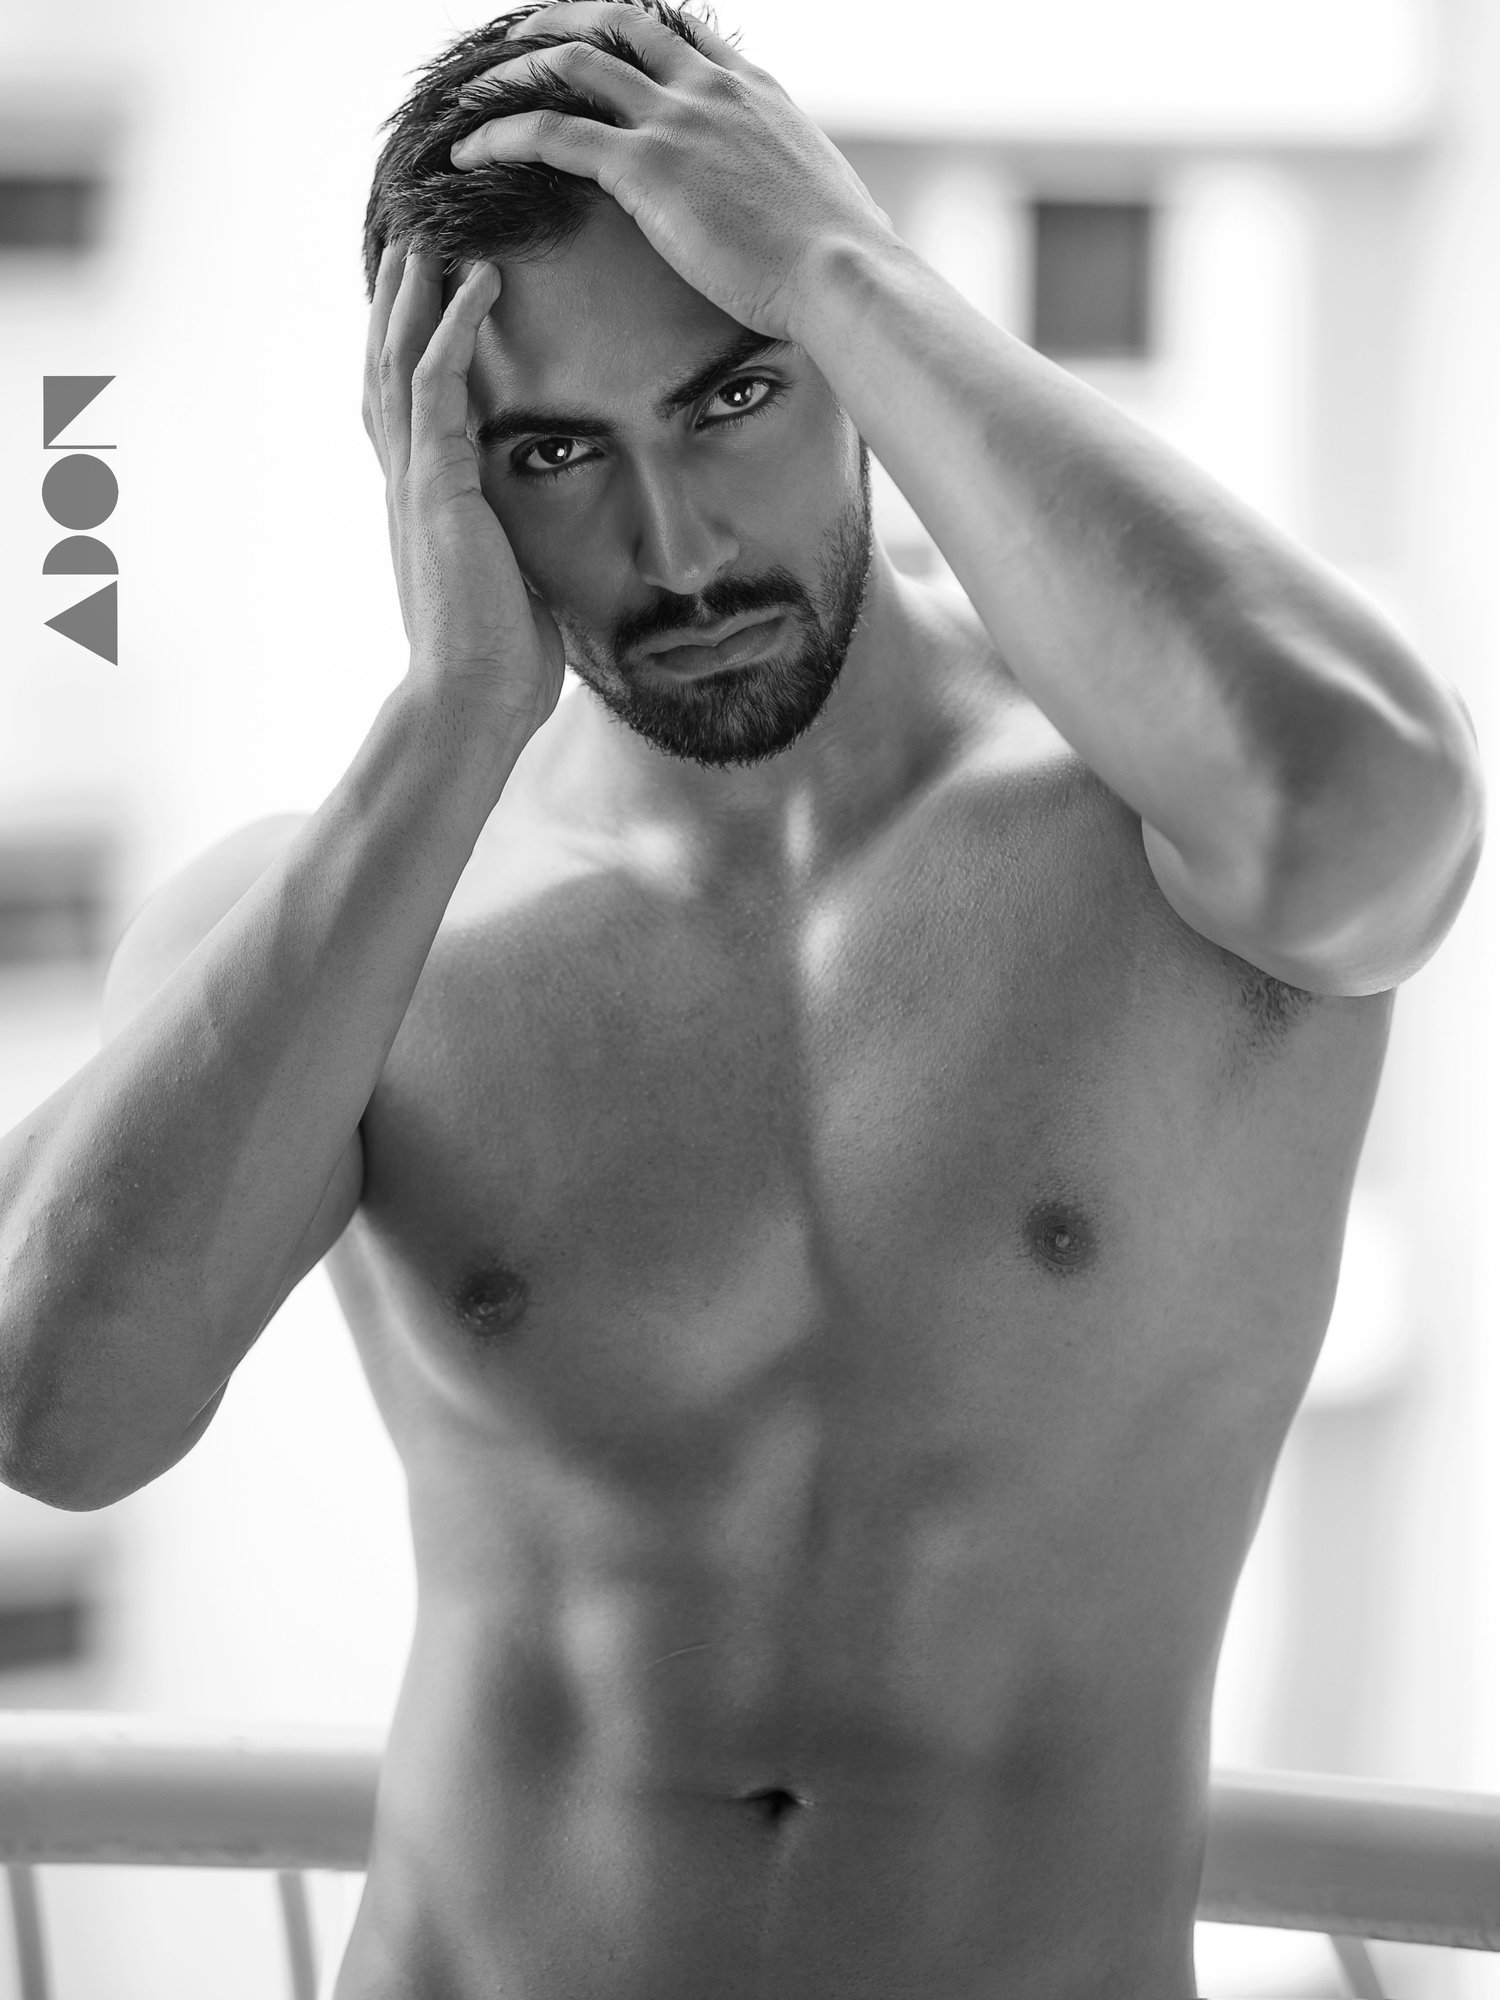 Adon Exclusive: Model Mosi Bouri By Jason Oung